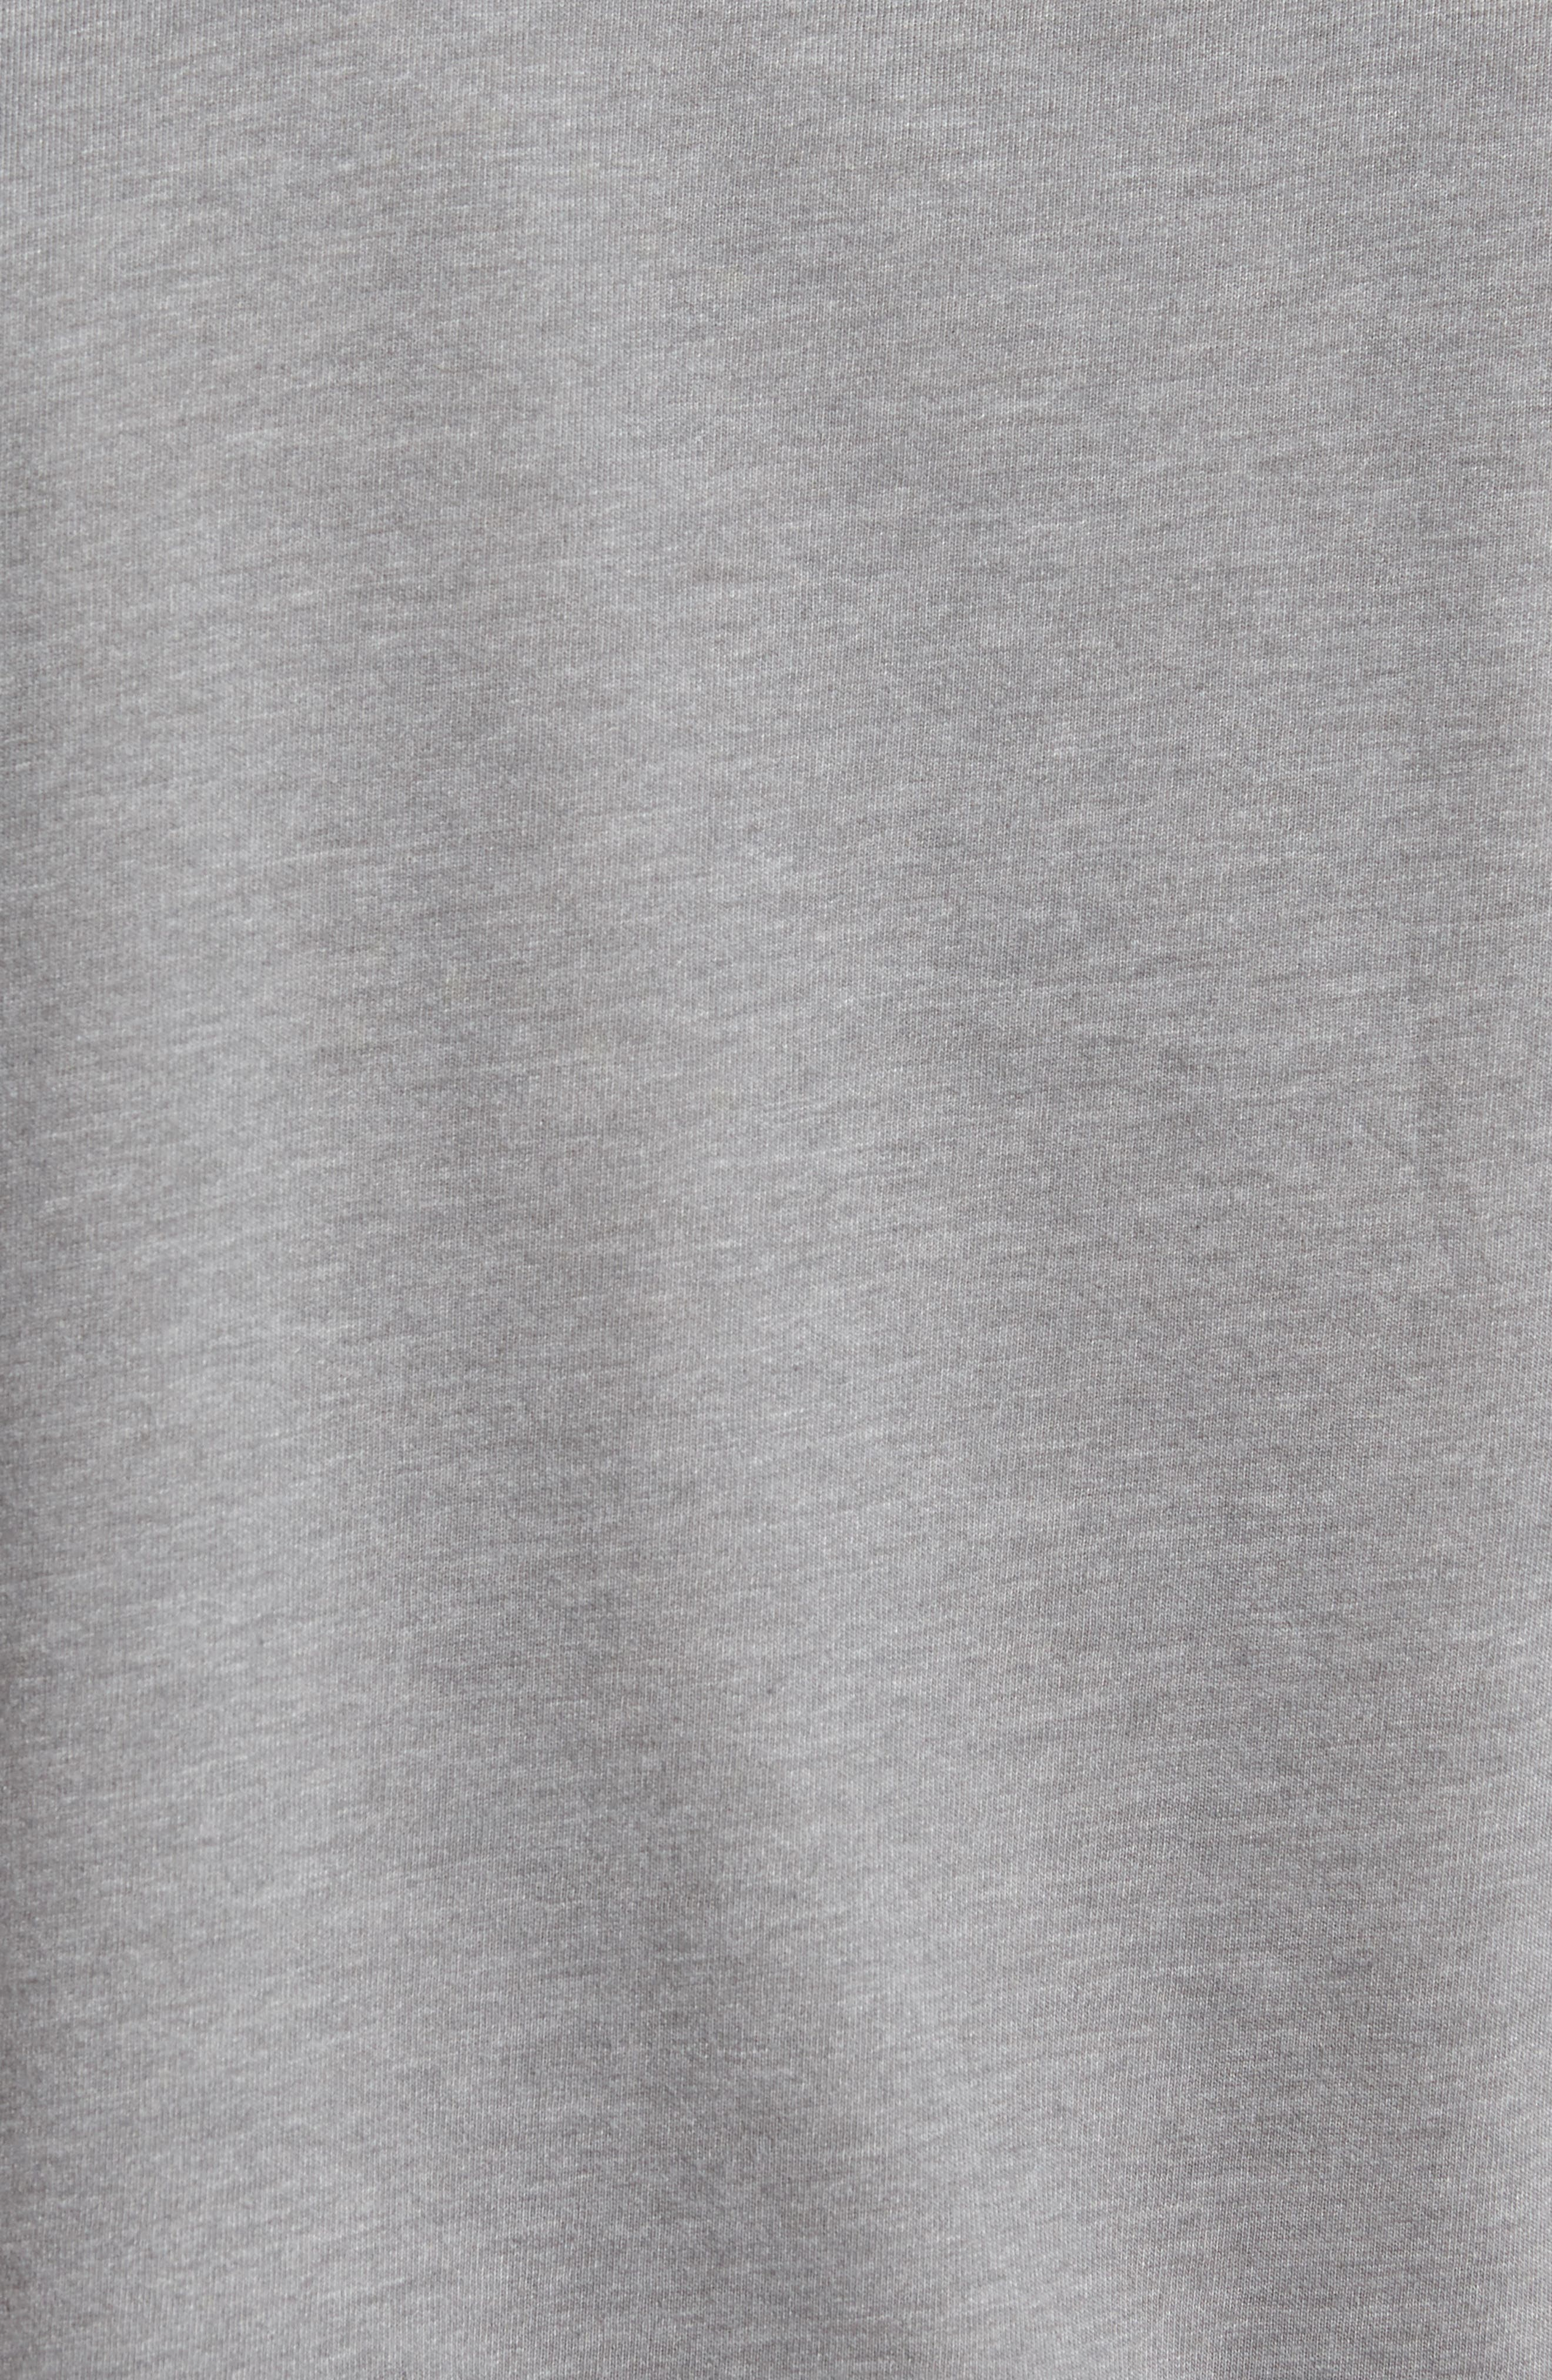 Chappy Doo Pocket T-Shirt,                             Alternate thumbnail 5, color,                             Heather Grey